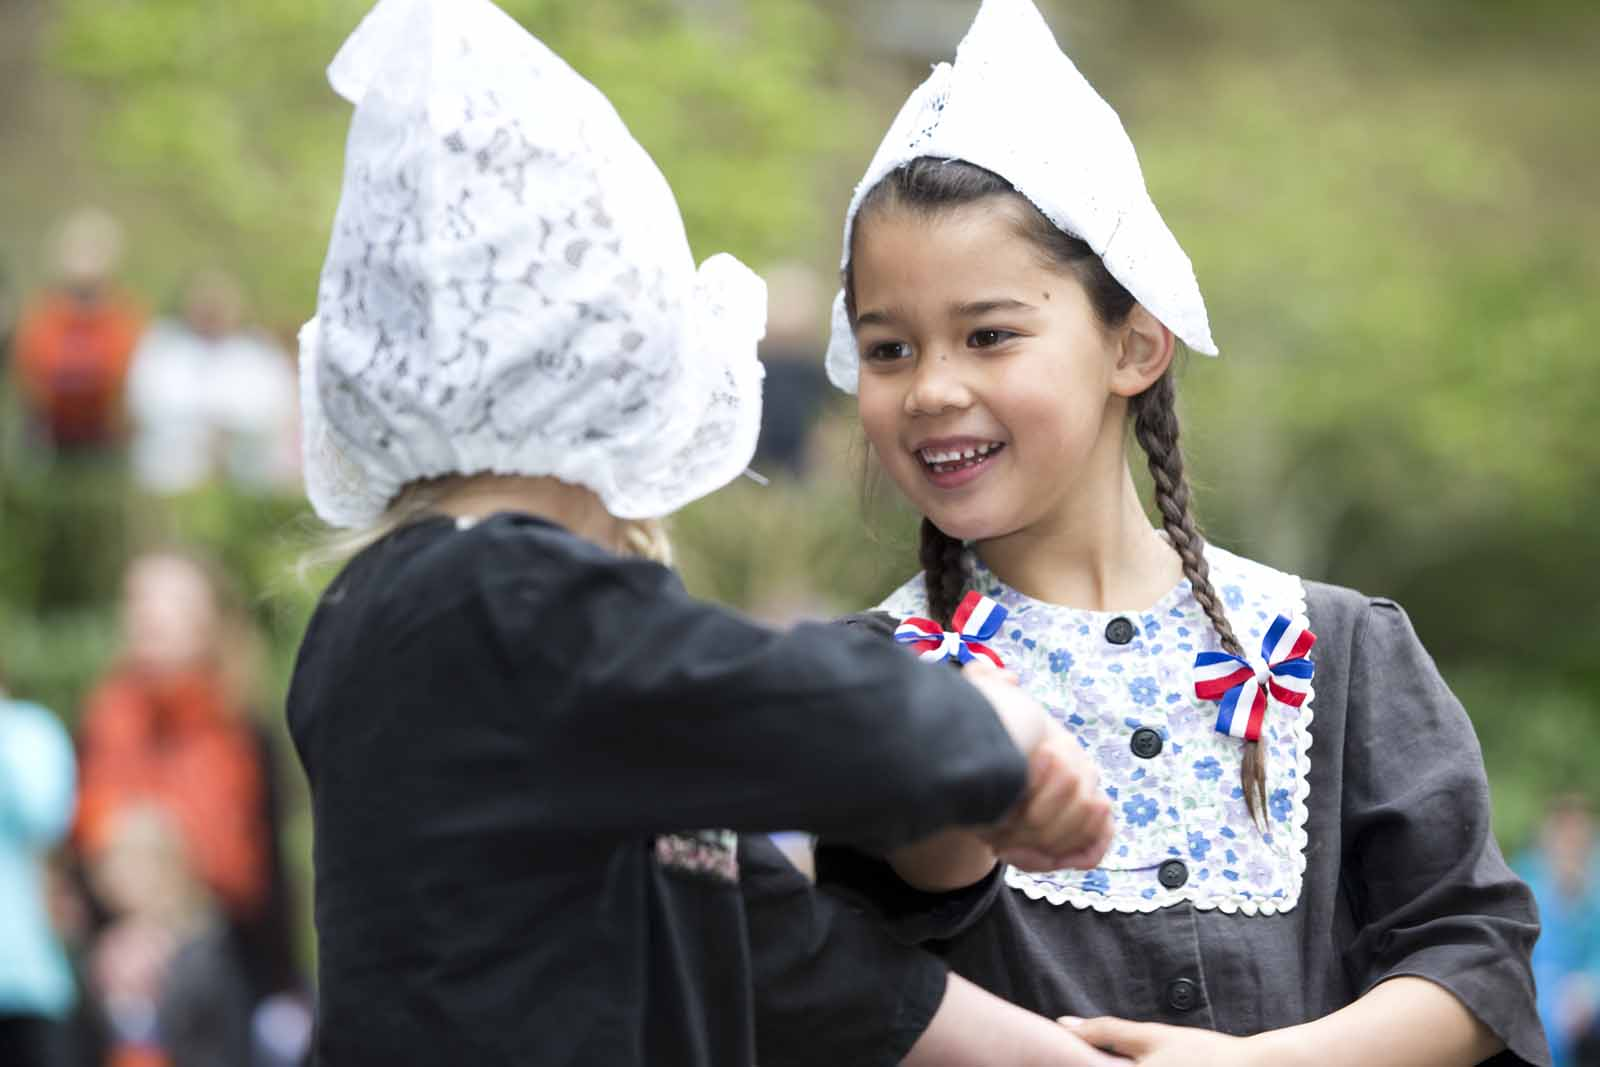 Dutch-girls-dance-traditional-costume.jpg